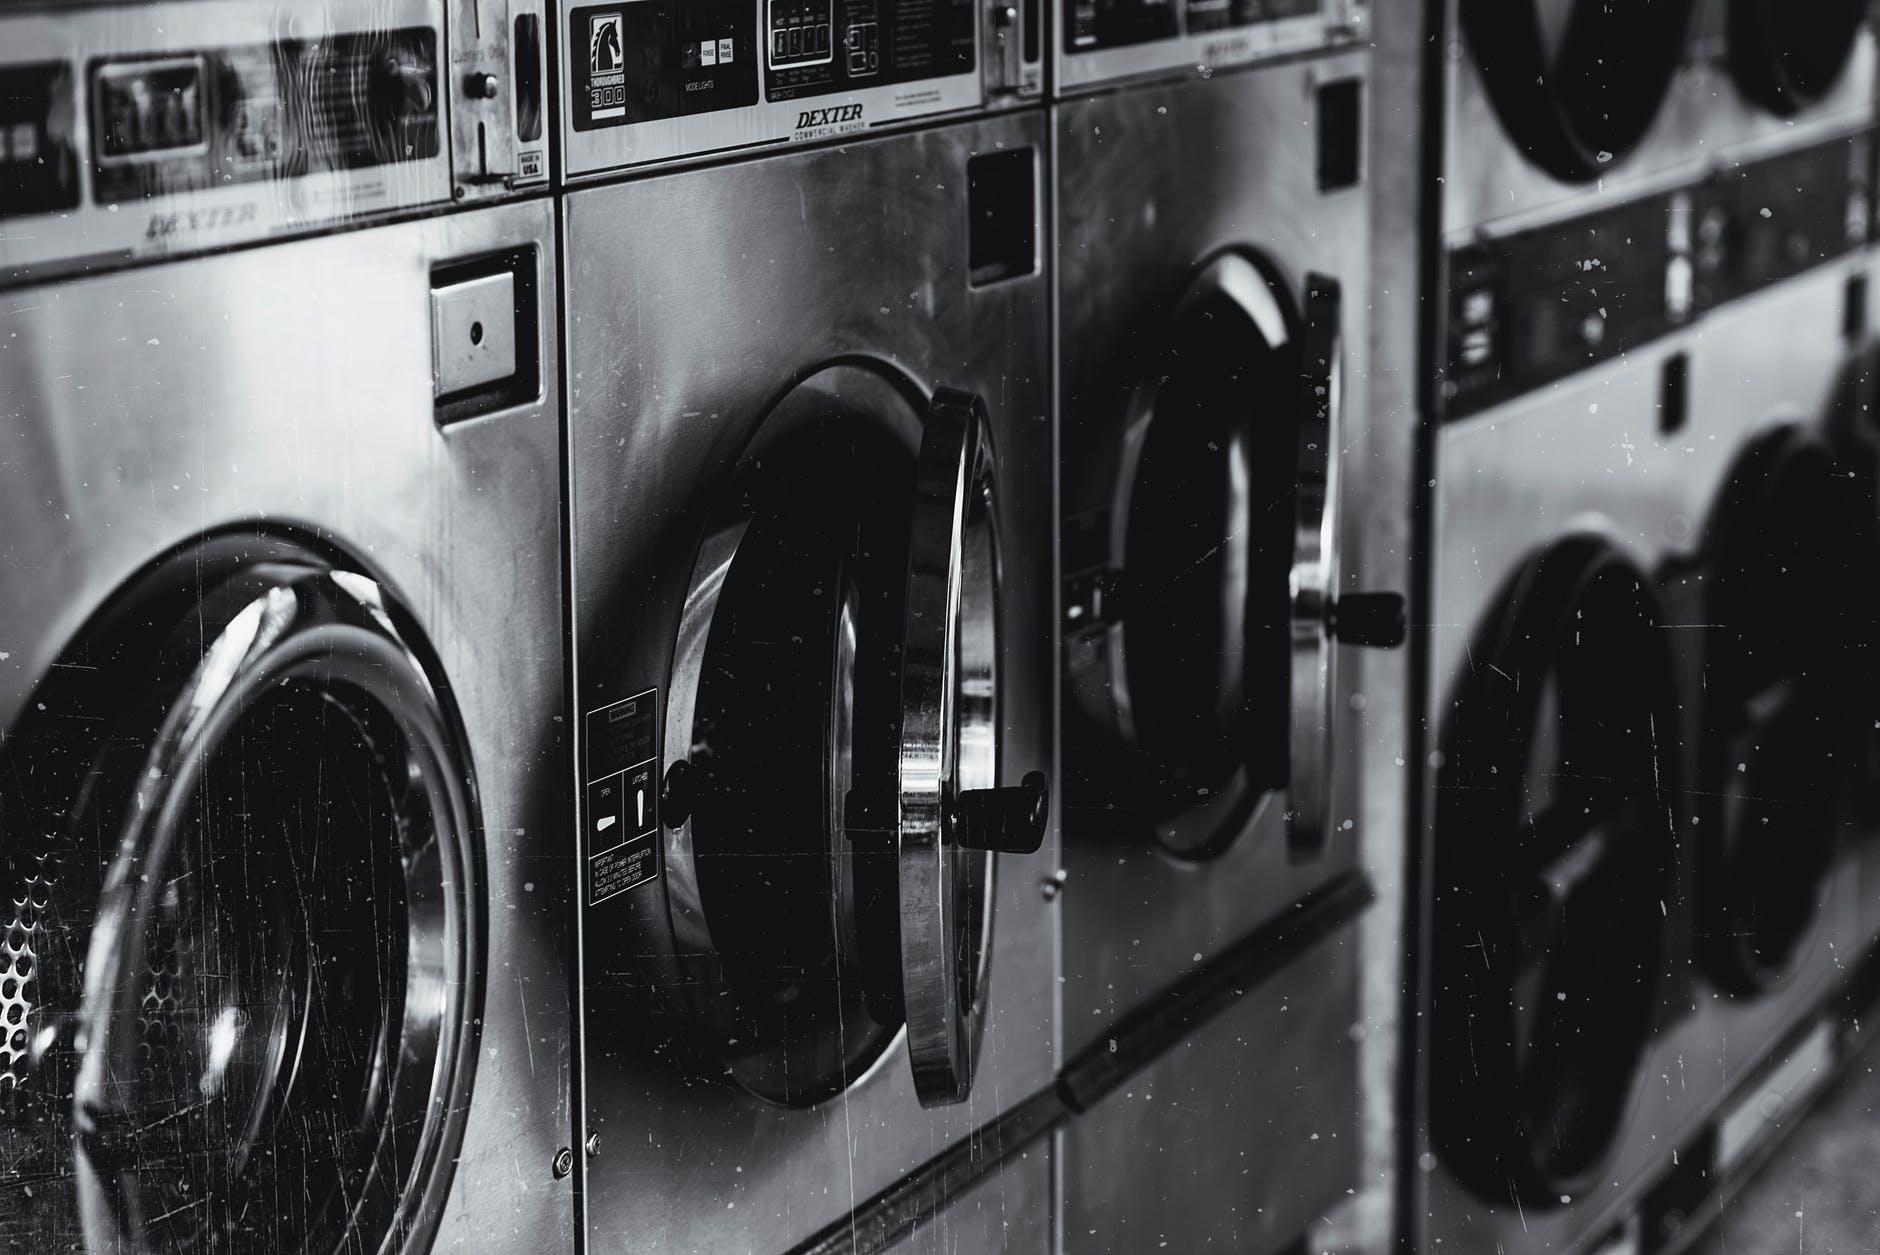 Harga Mesin Cuci Polytron  2 Tabung yang Jadi Unggulan